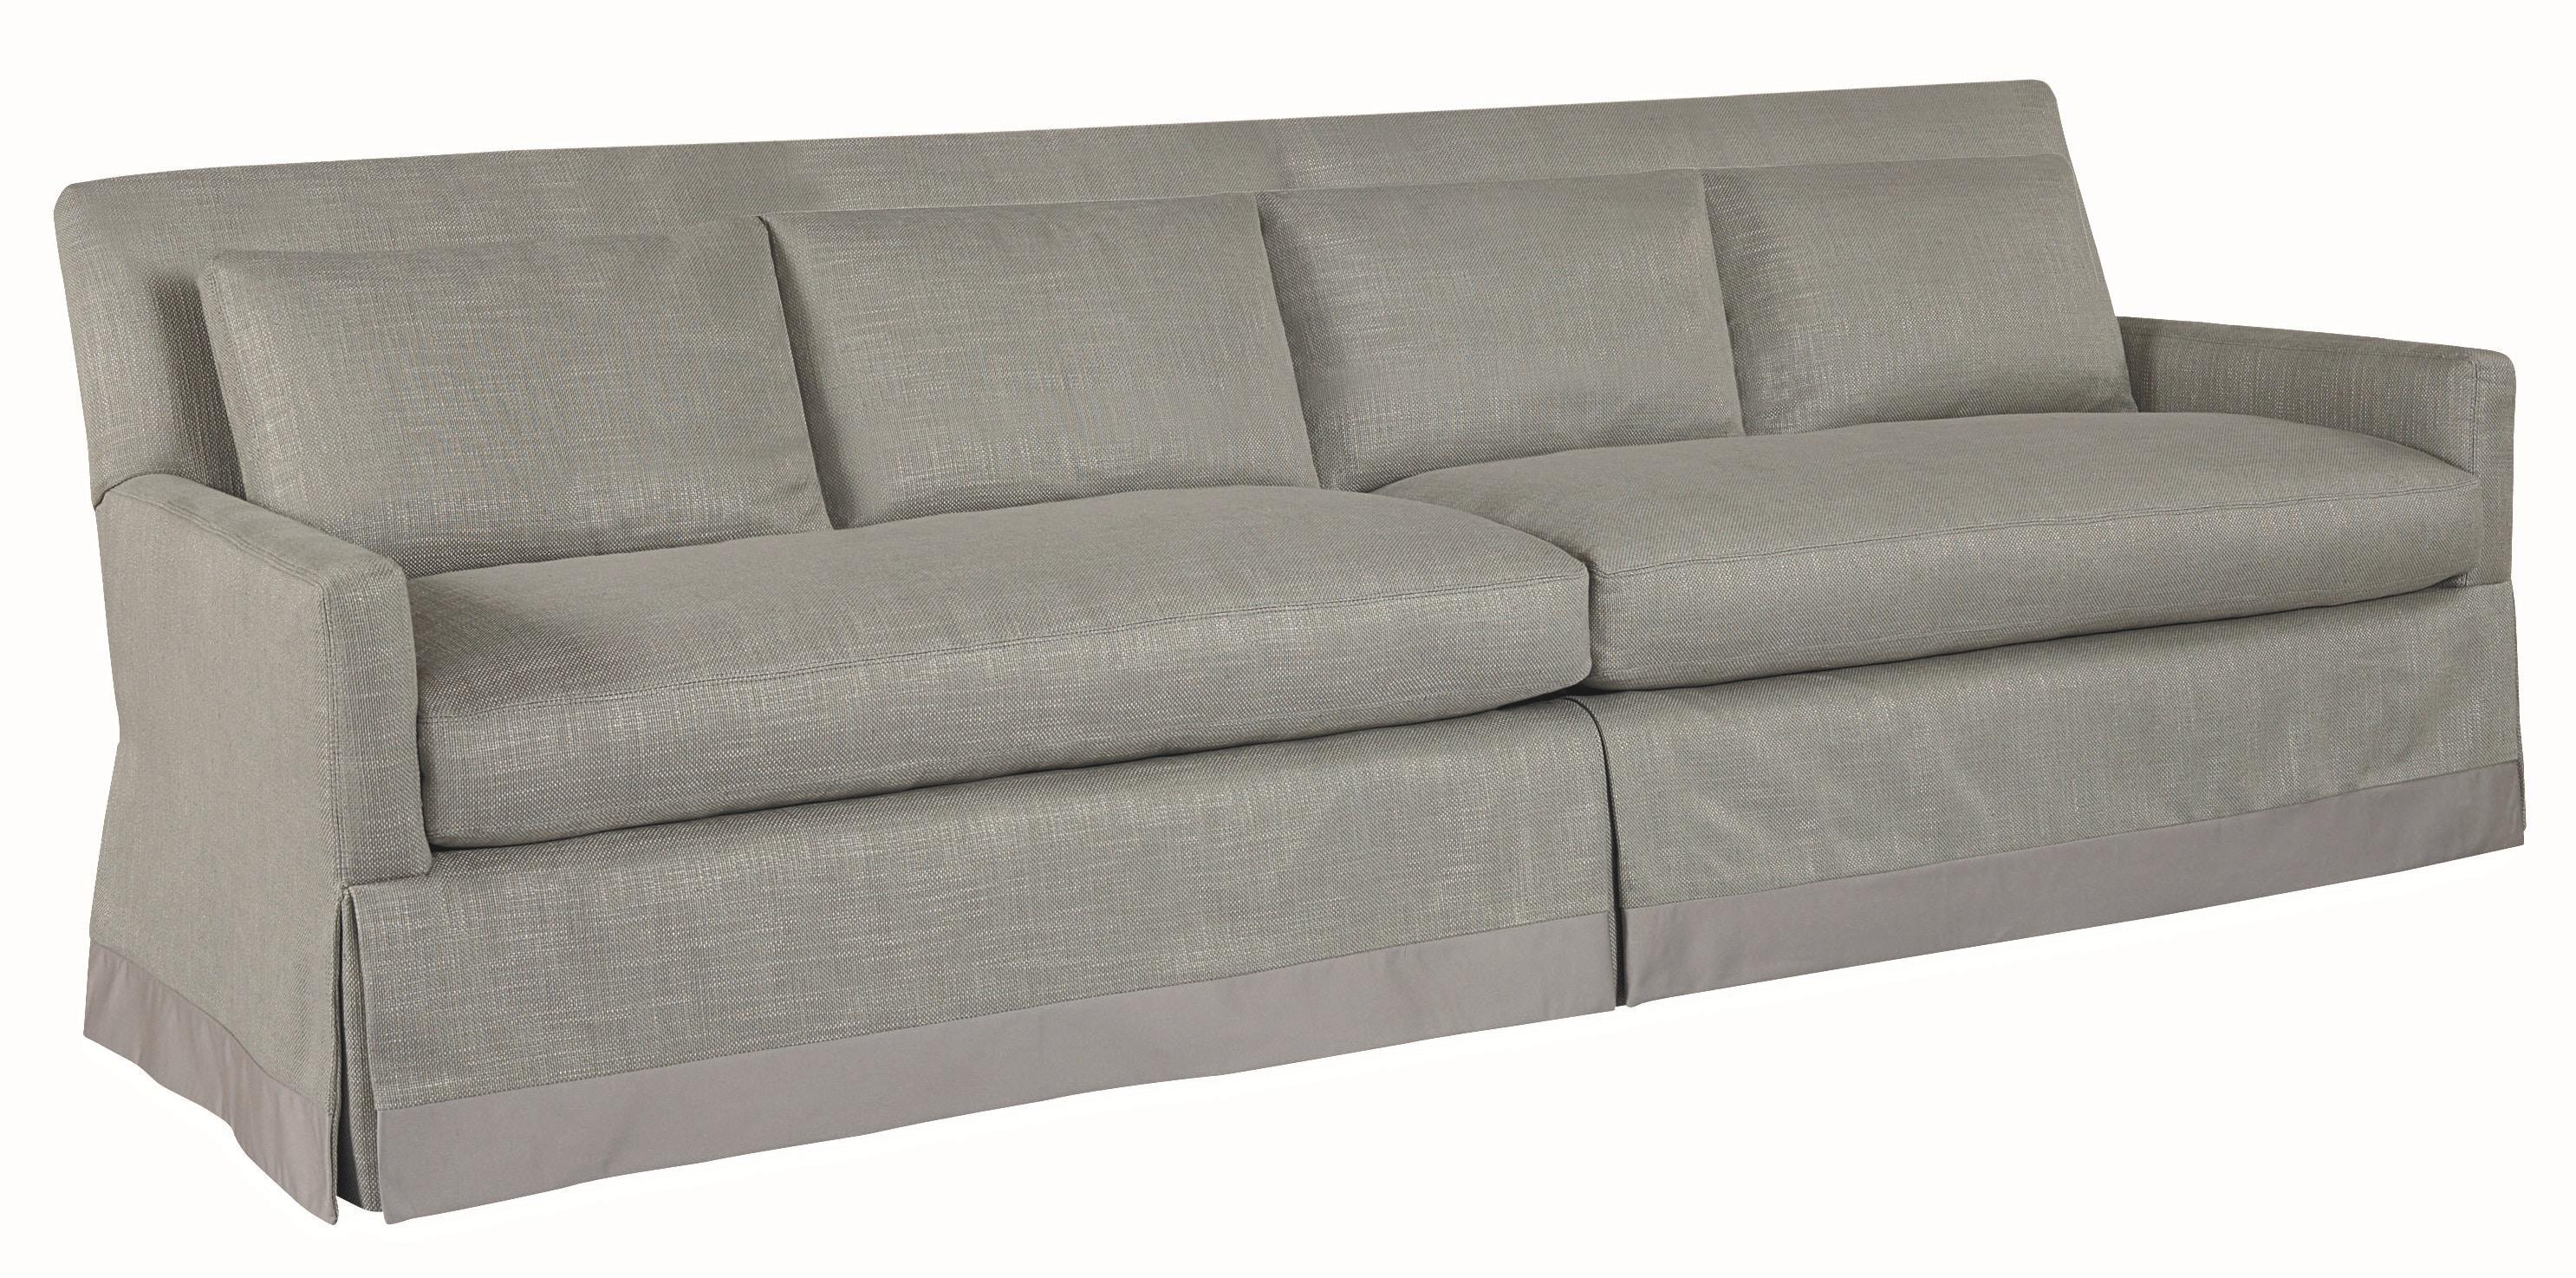 Lee Industries Two Cushion Four Back Sofa 3907 44